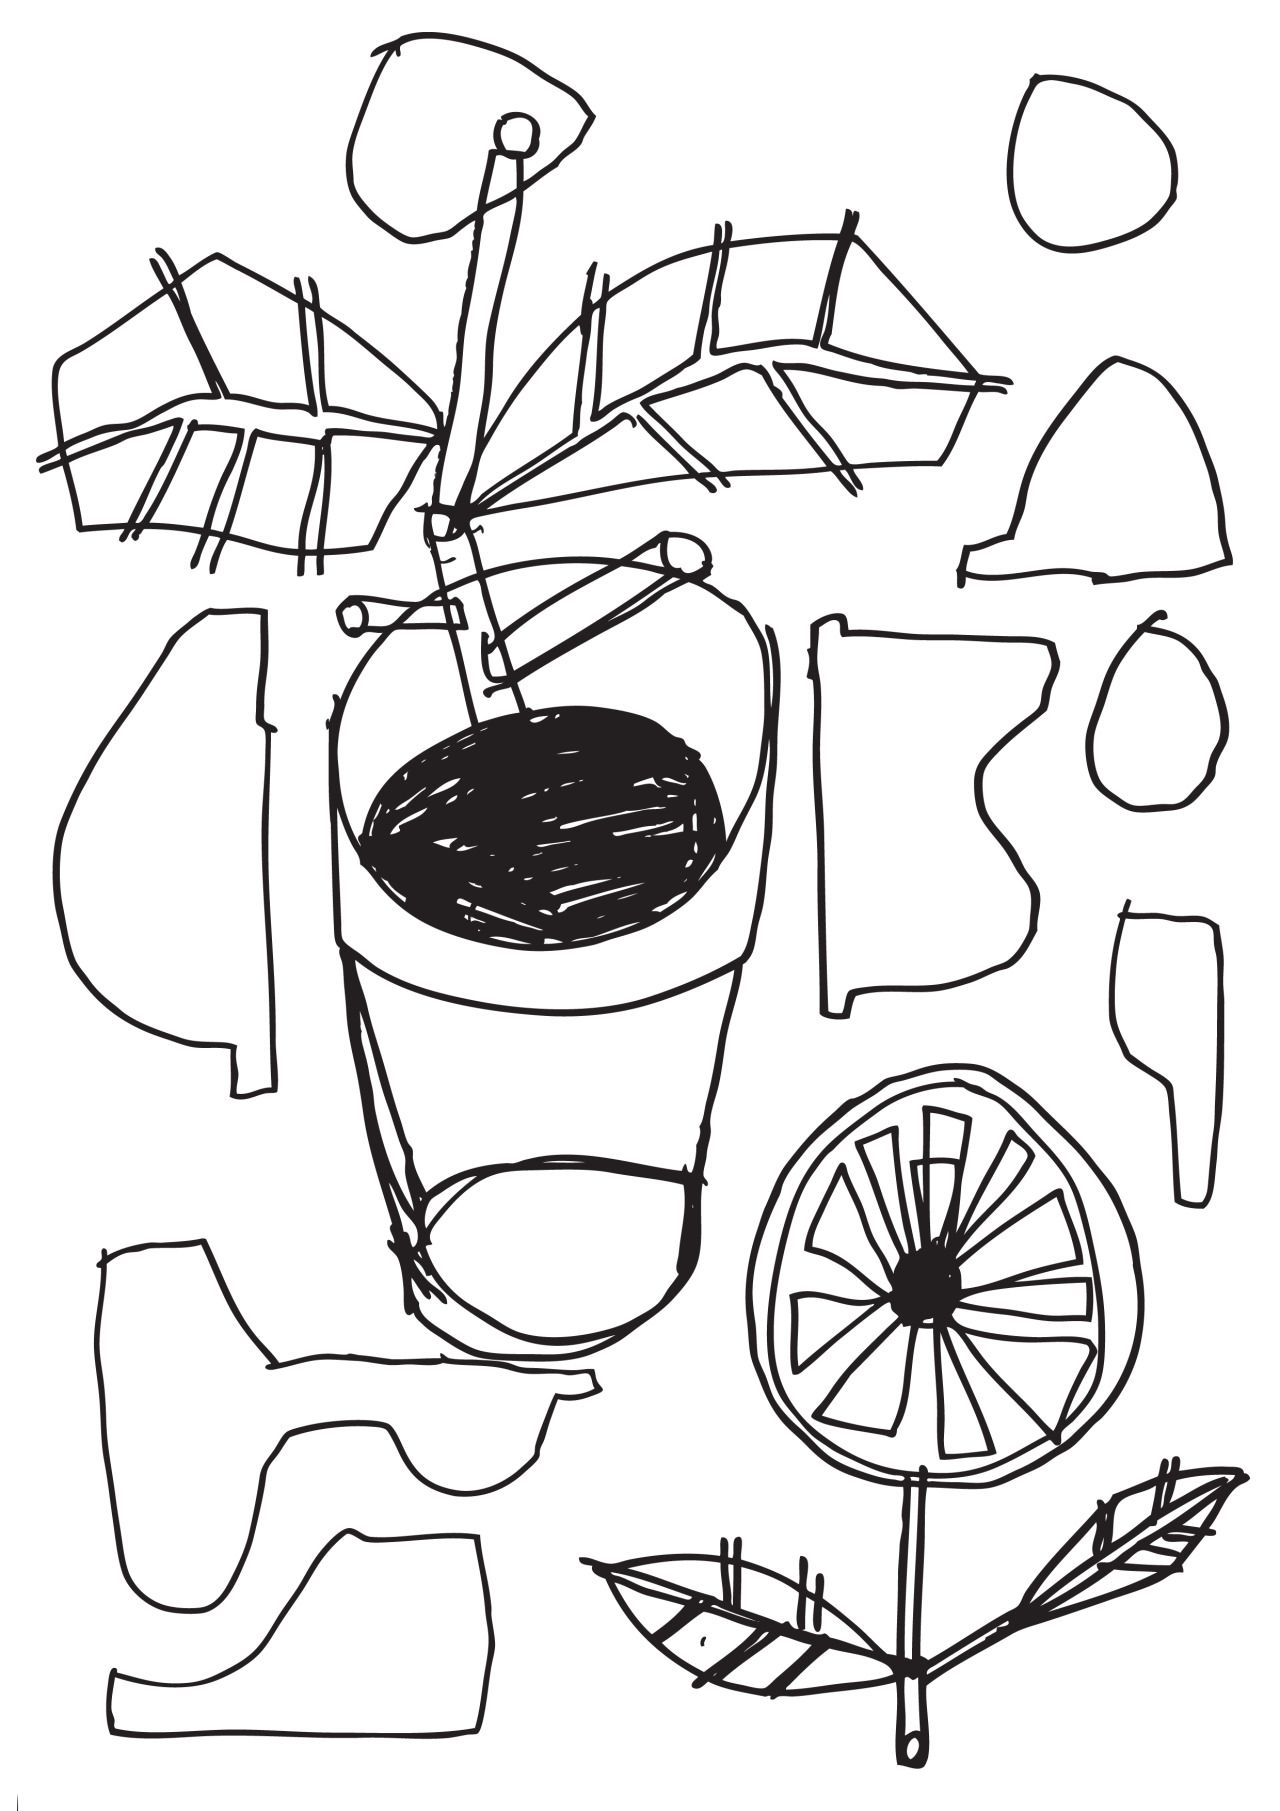 pot plant  hausblok co uk  illustration  plants  drawing